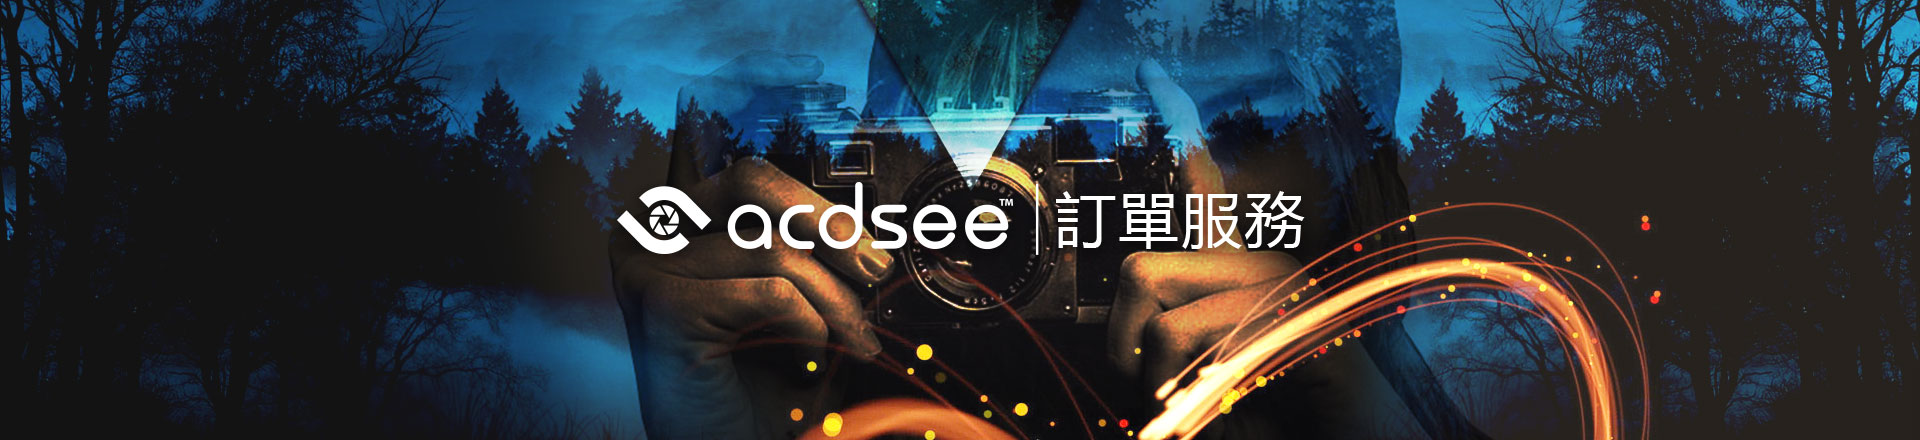 acdsee 10 繁體 中文 版